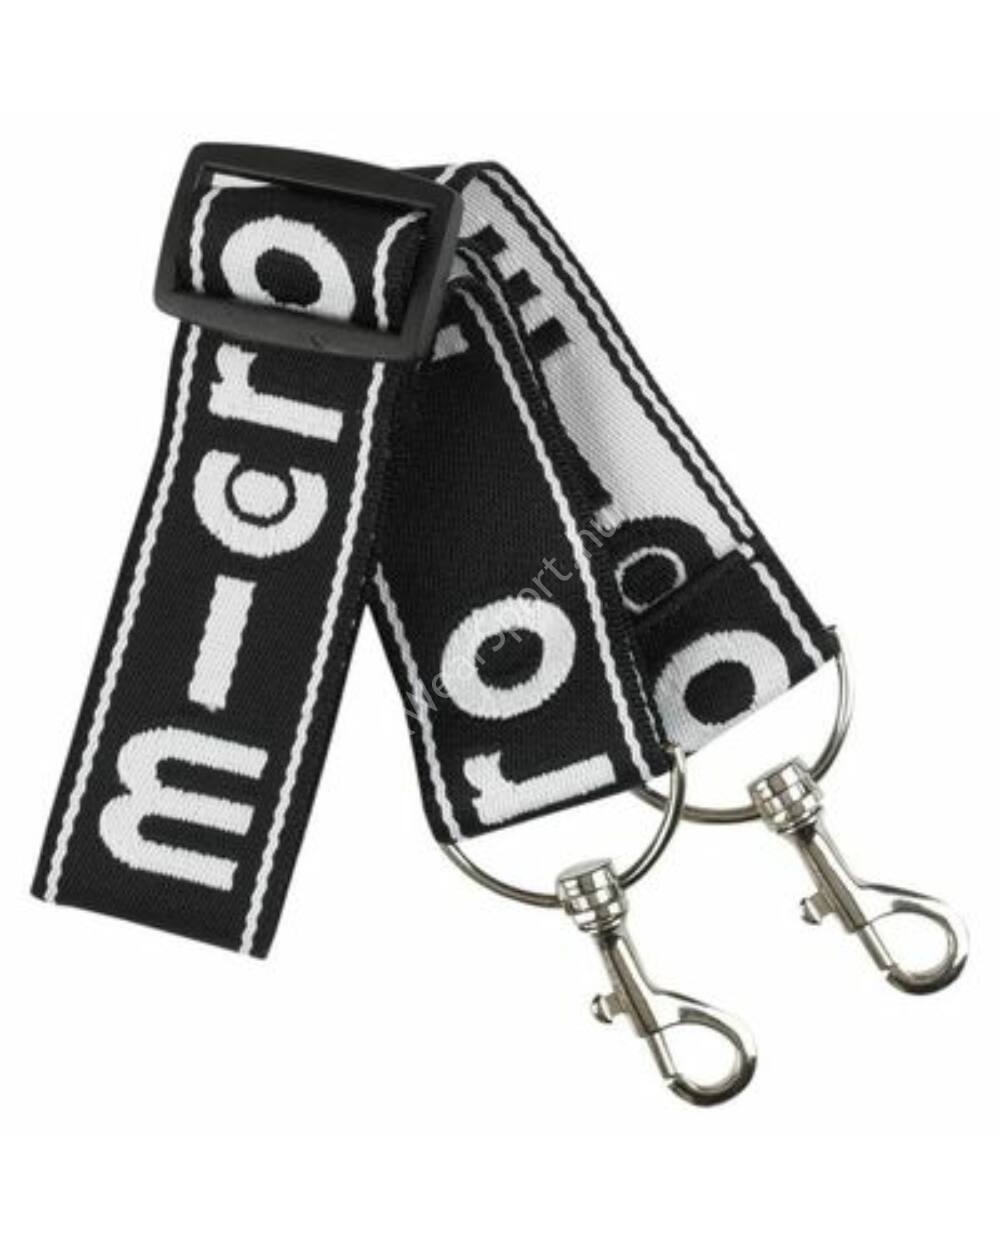 Micro vállpánt Sprite, Speed+, White/Black, Flex rollerekhez